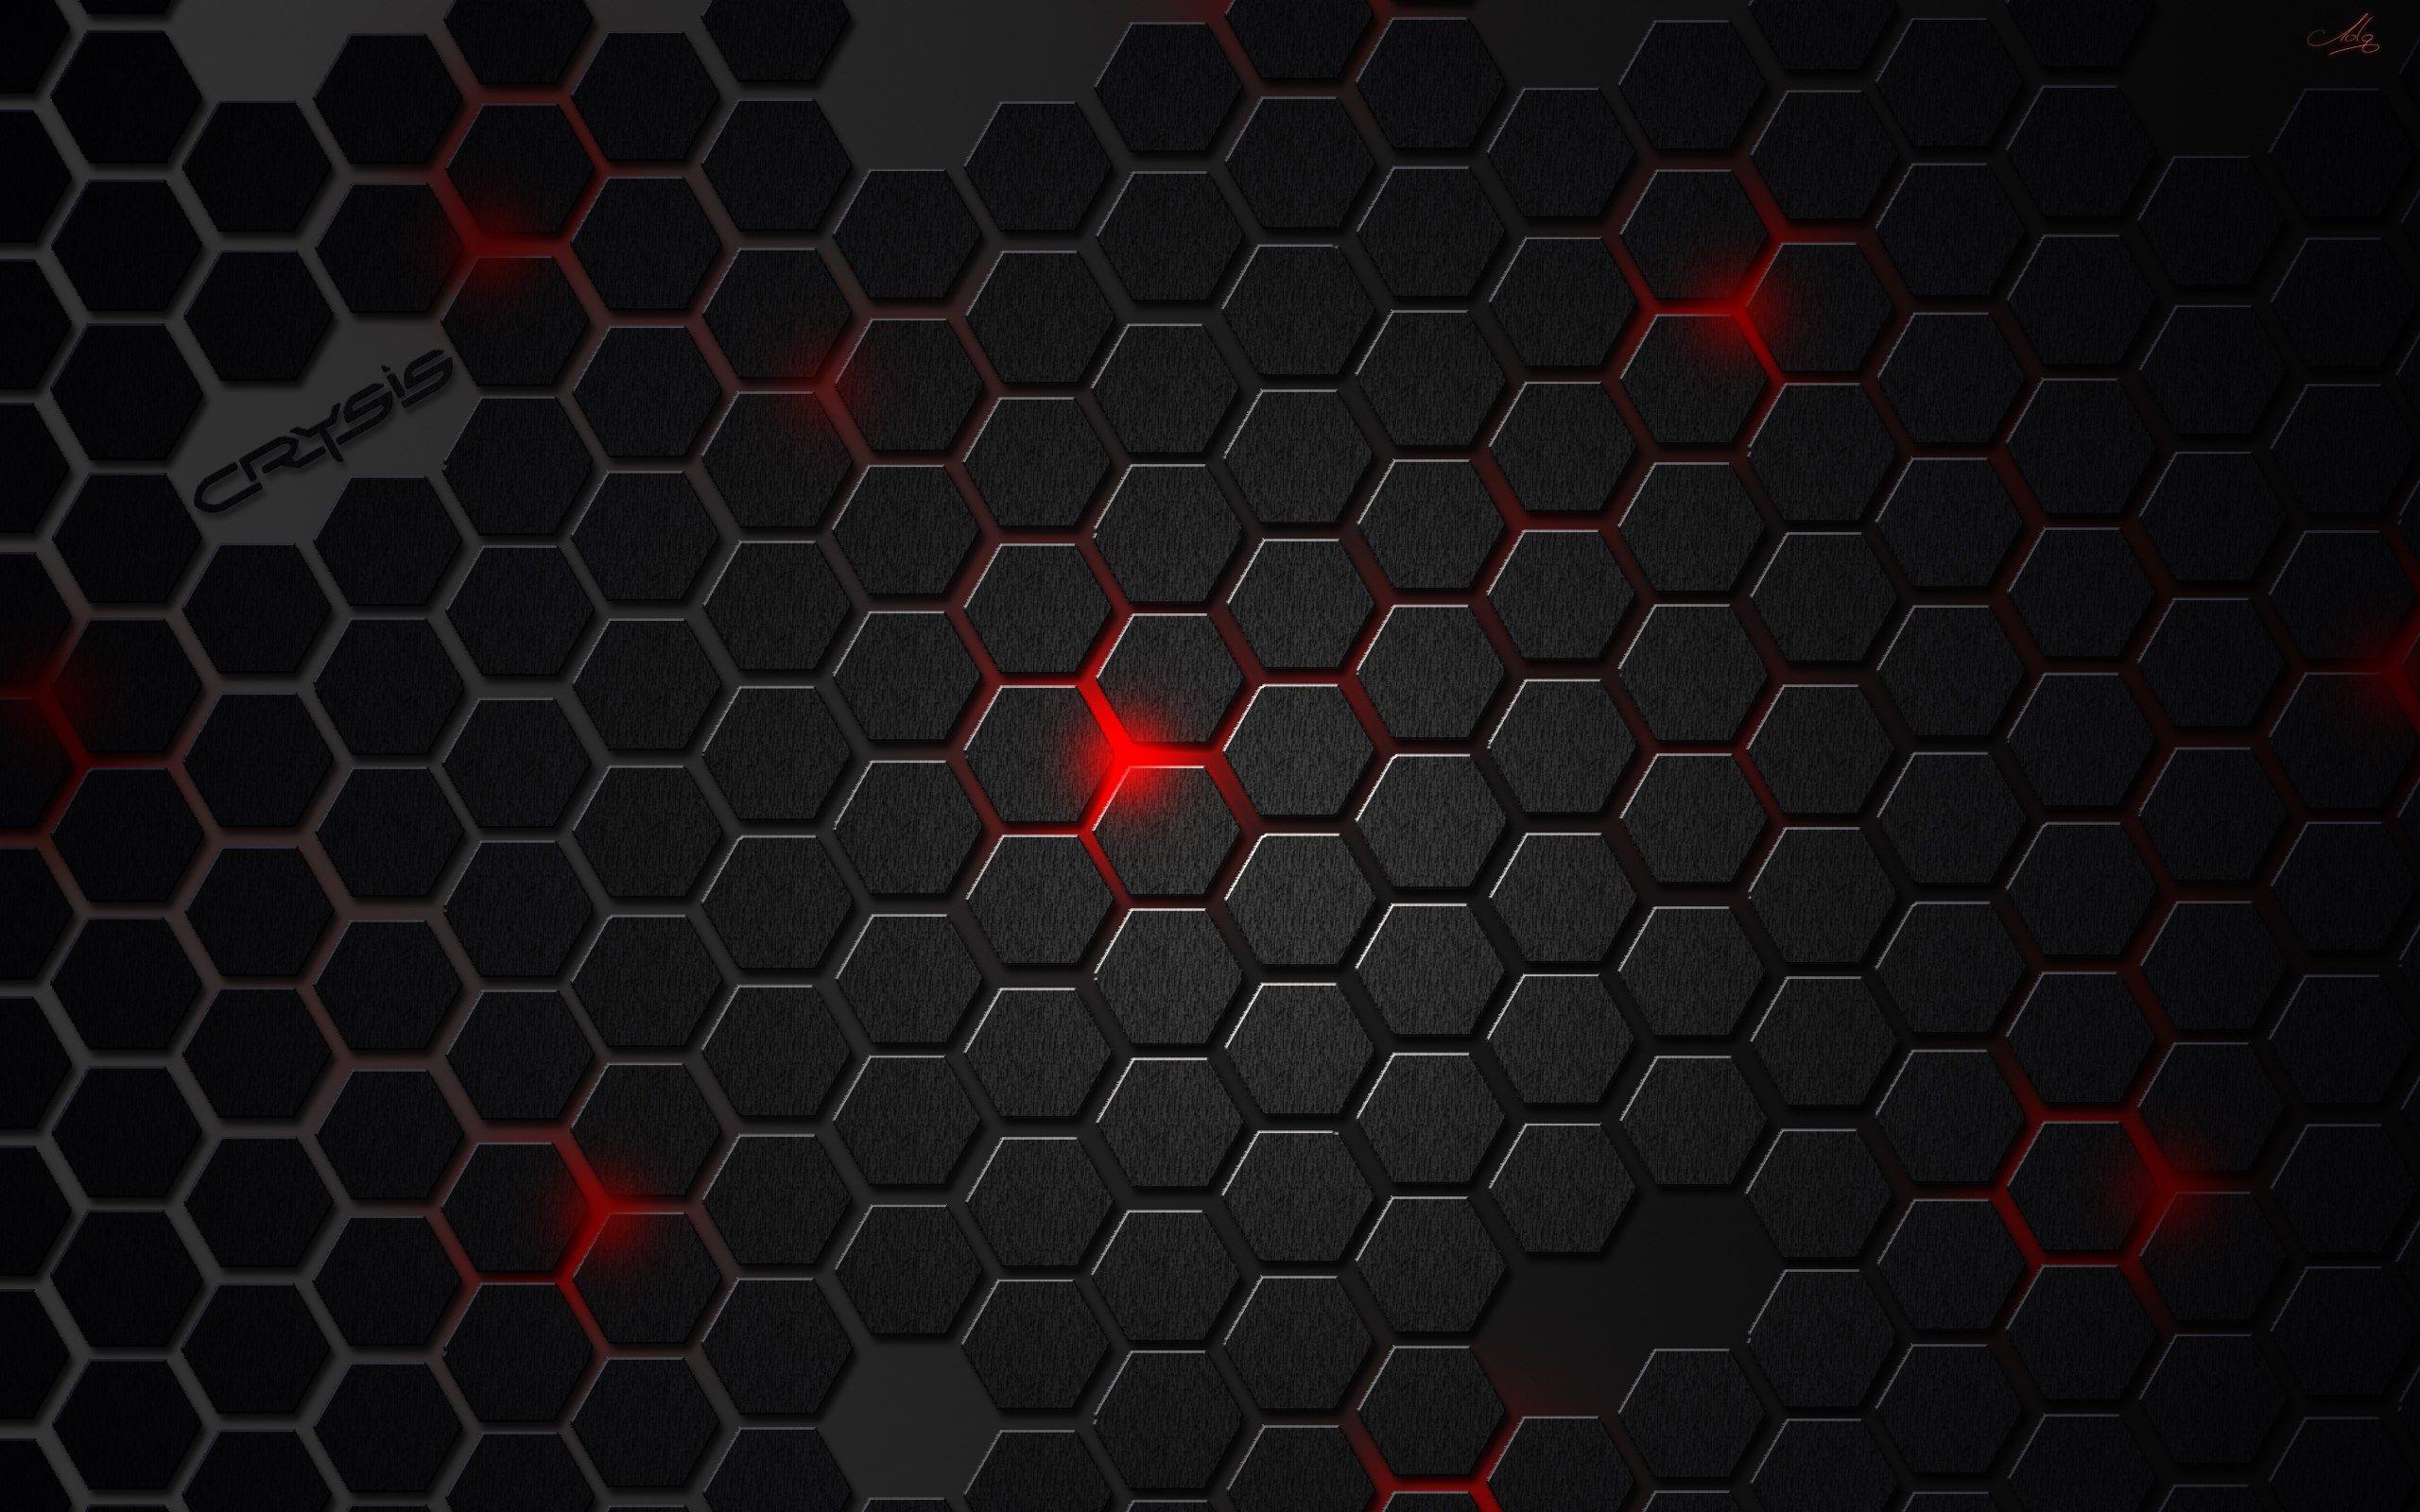 Black Wallpaper Hd Android Wallpaper Black Cool Black Wallpaper Black Hd Wallpaper